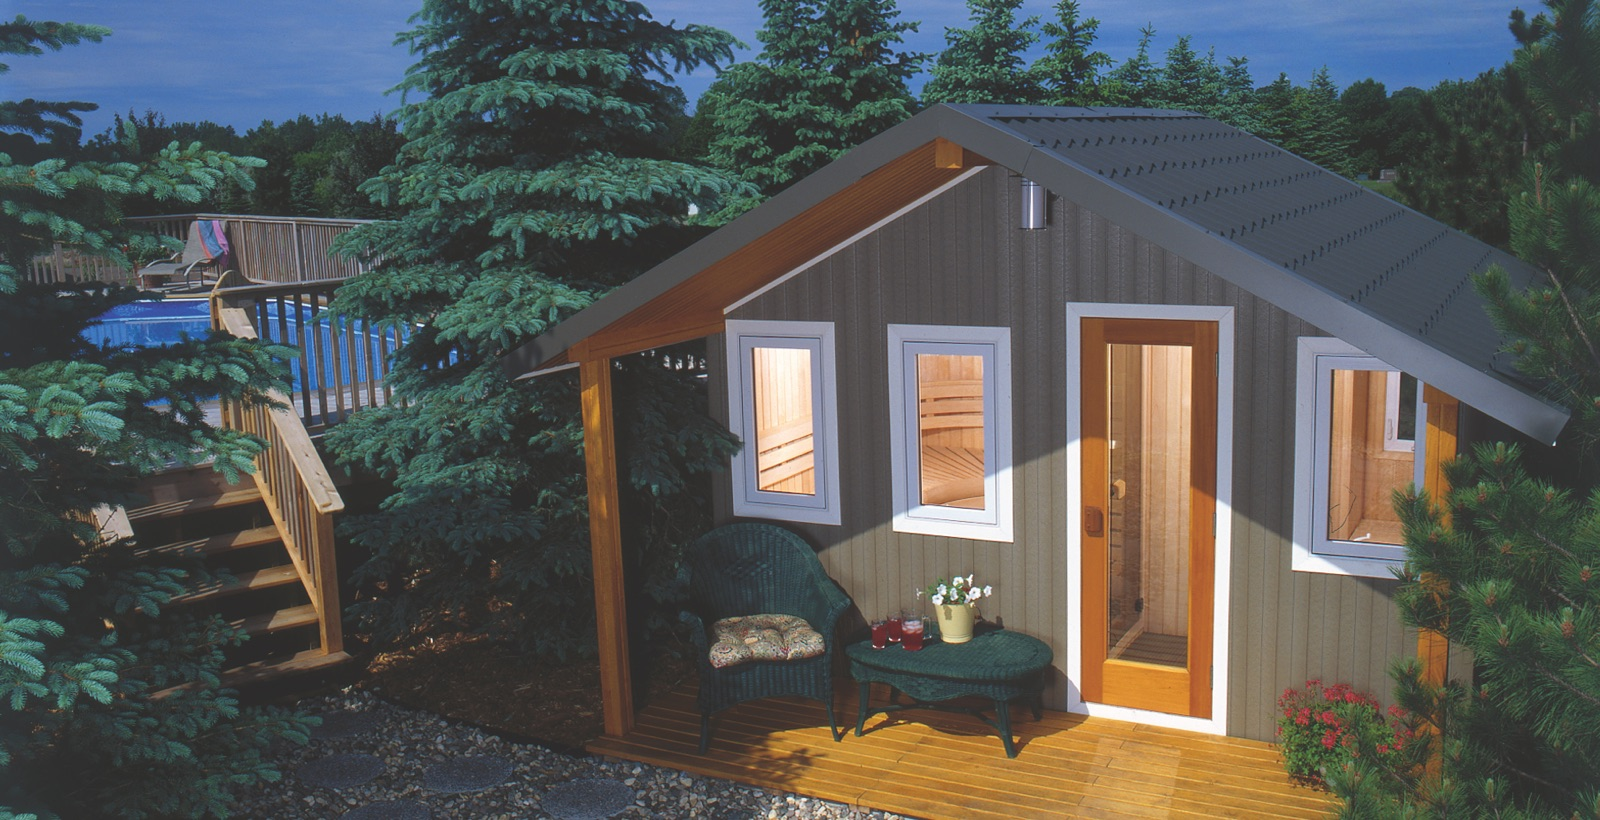 Traditional Finnish Outdoor Sauna by Finnleo